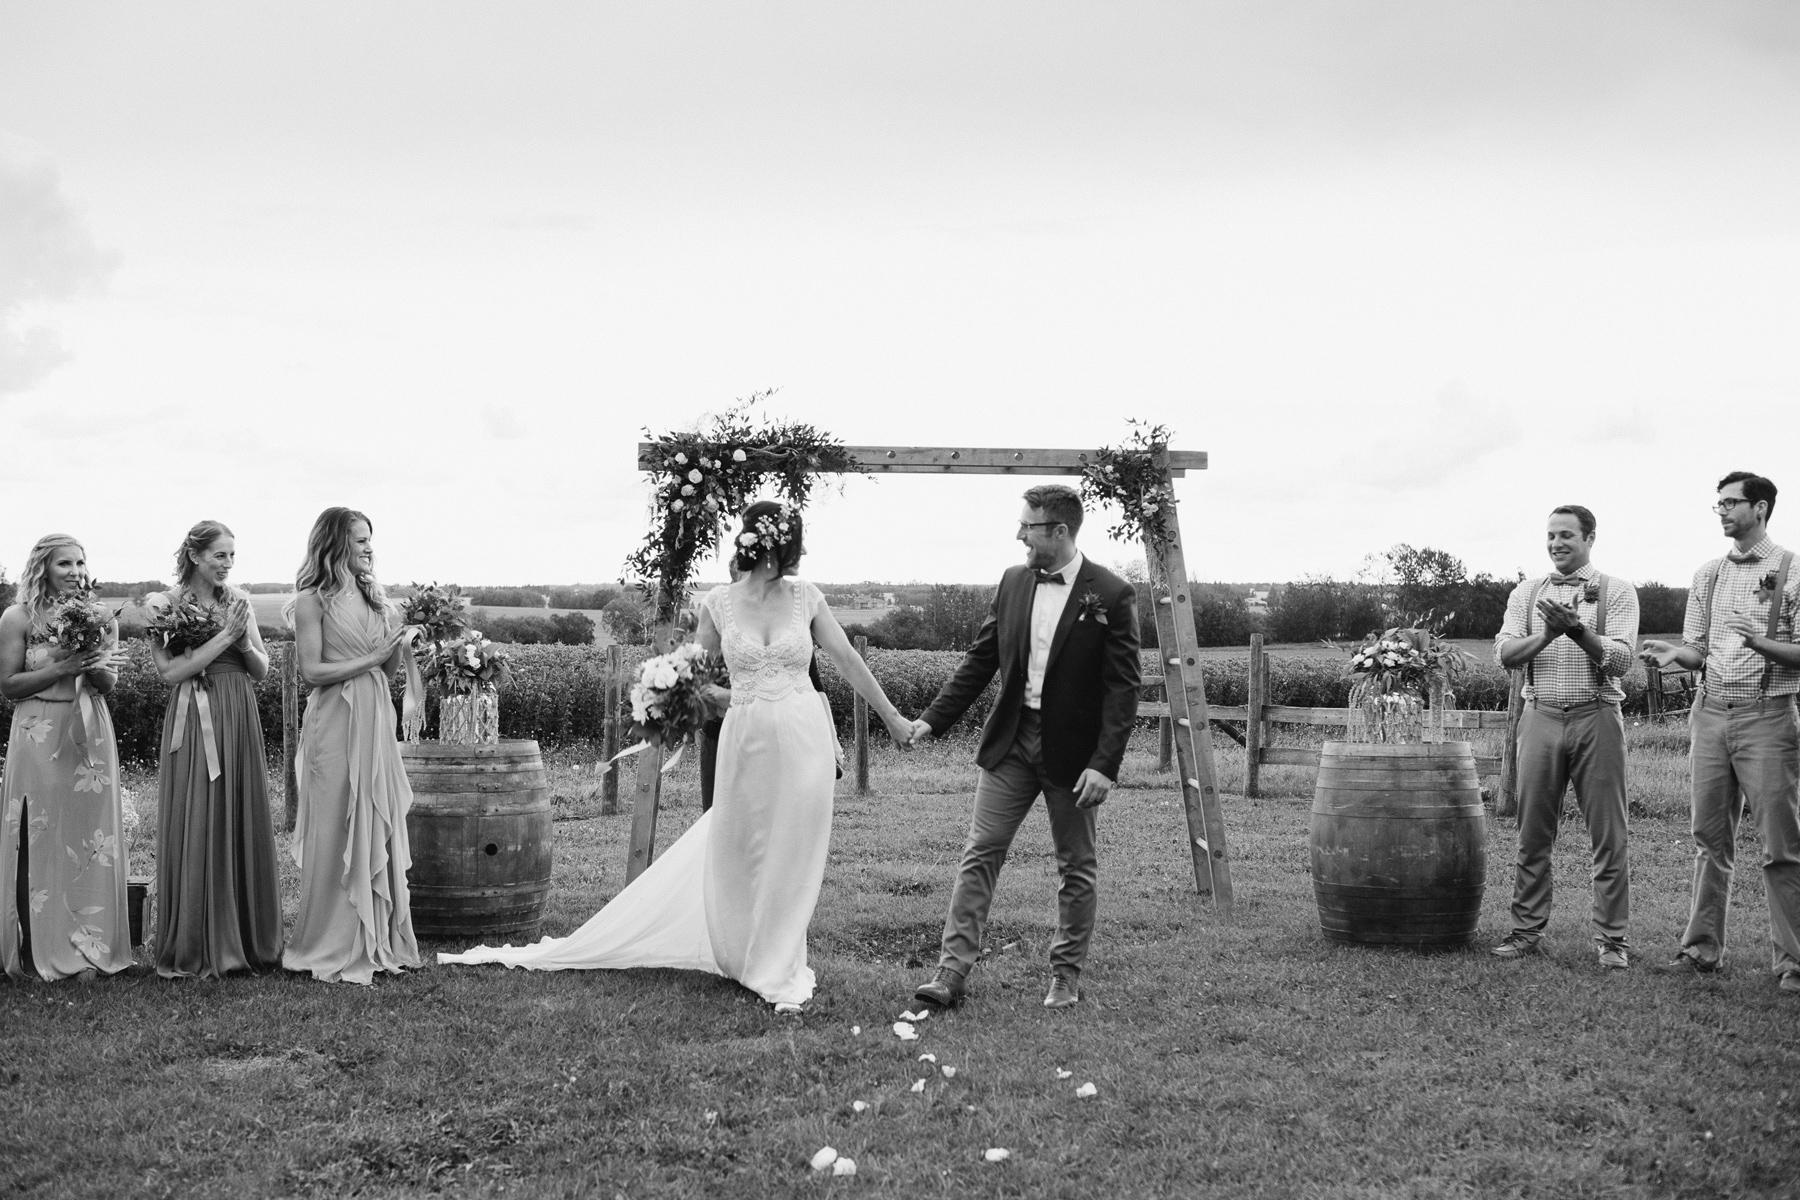 alberta-farm-wedding-photographer-rp-wj-147.jpg